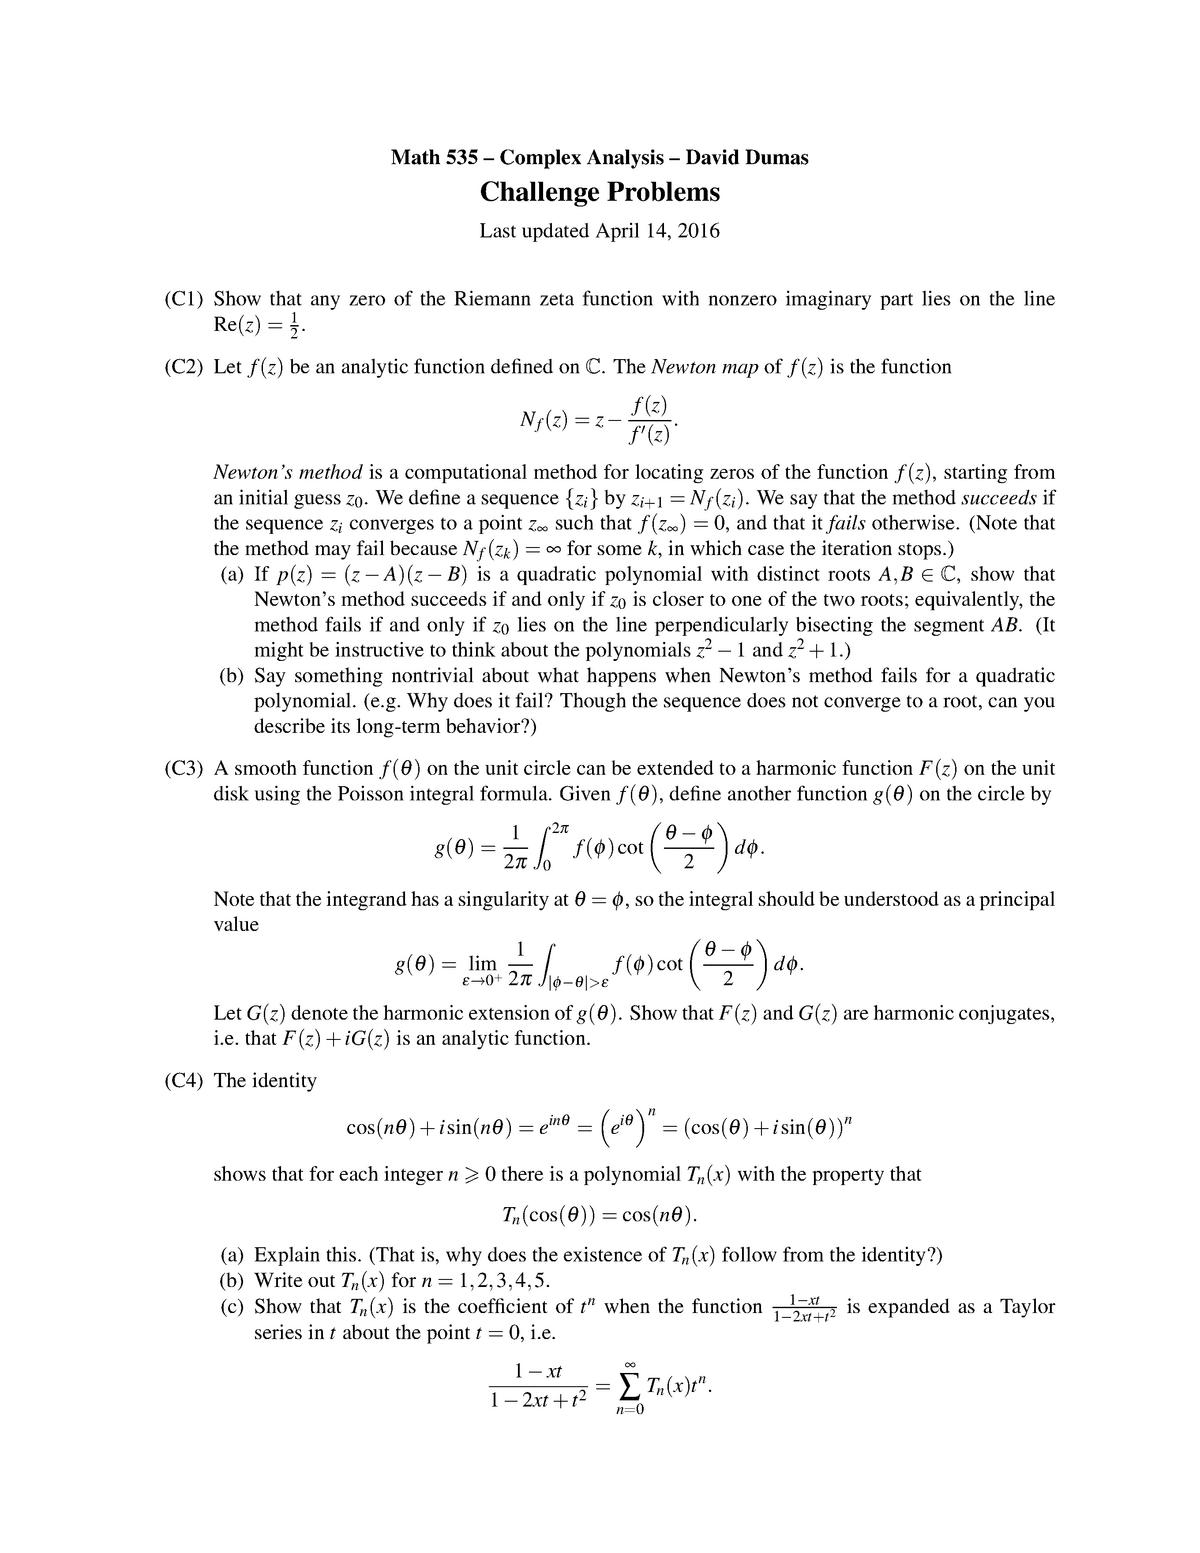 Math 535 - Challenge Problems - MATH 535: Complex Analysis I